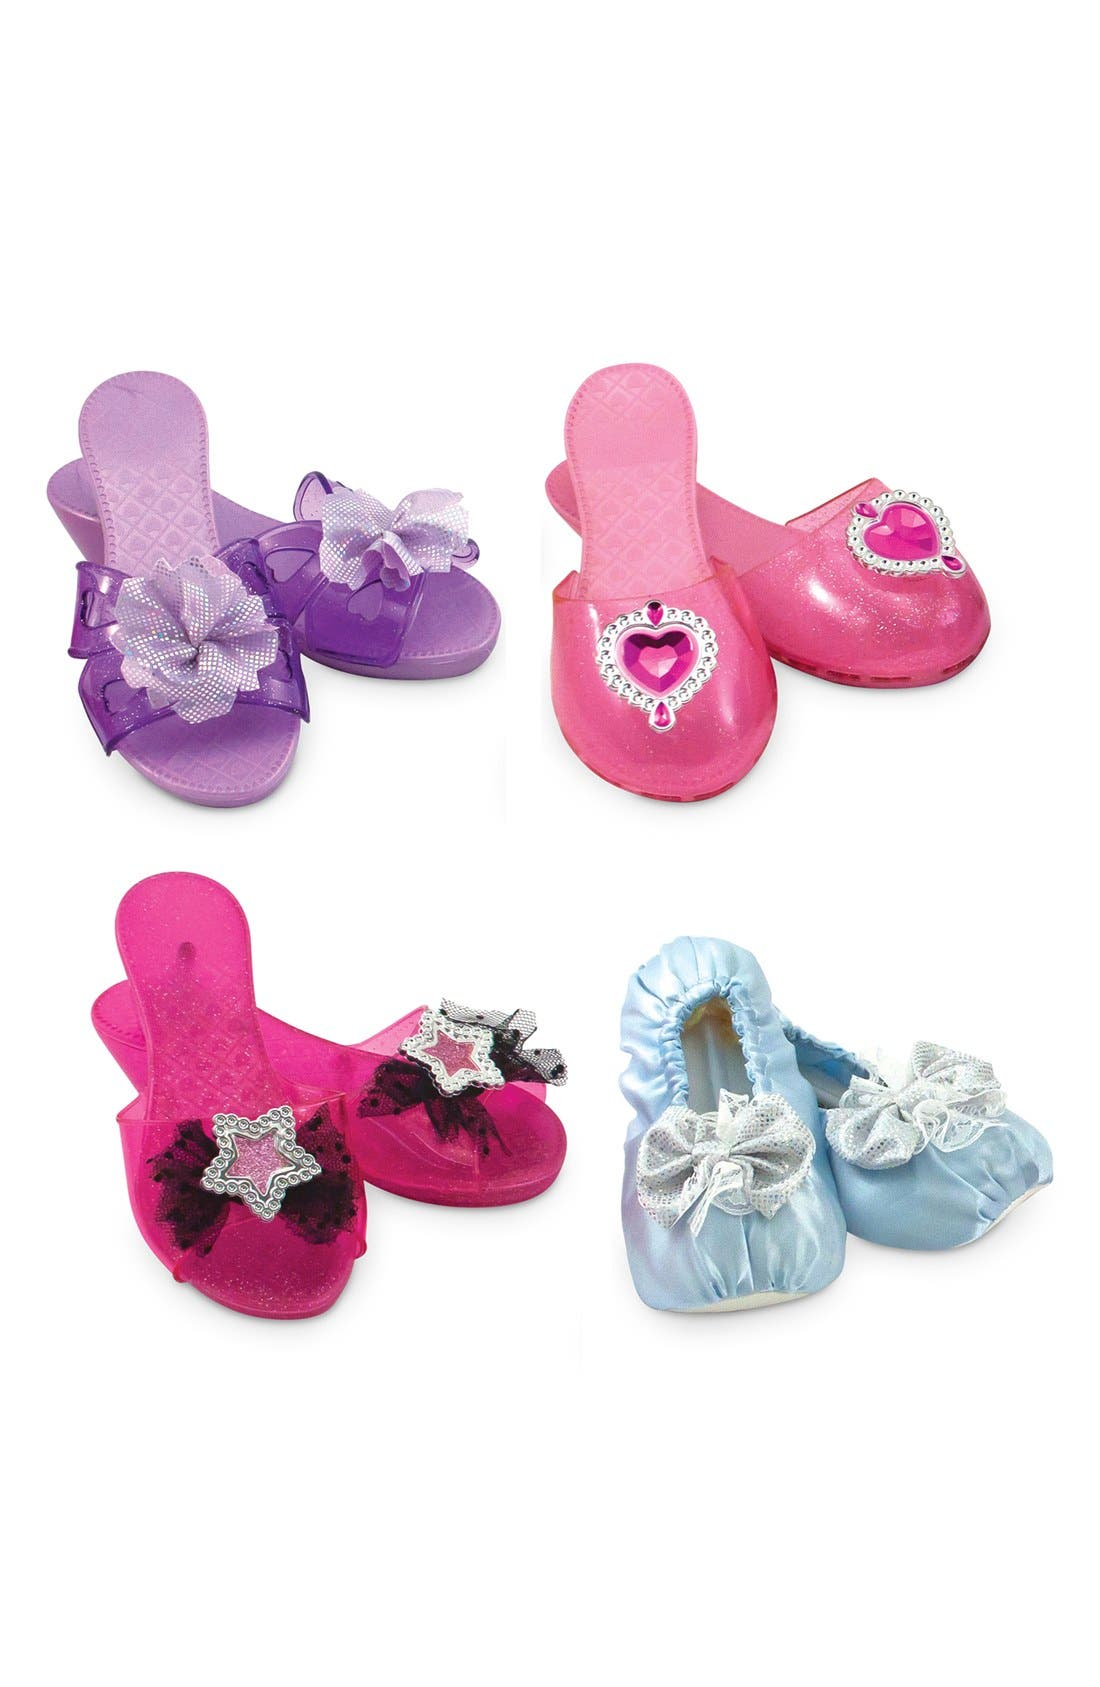 Dress-Up Shoe Set,                             Main thumbnail 1, color,                             Pink